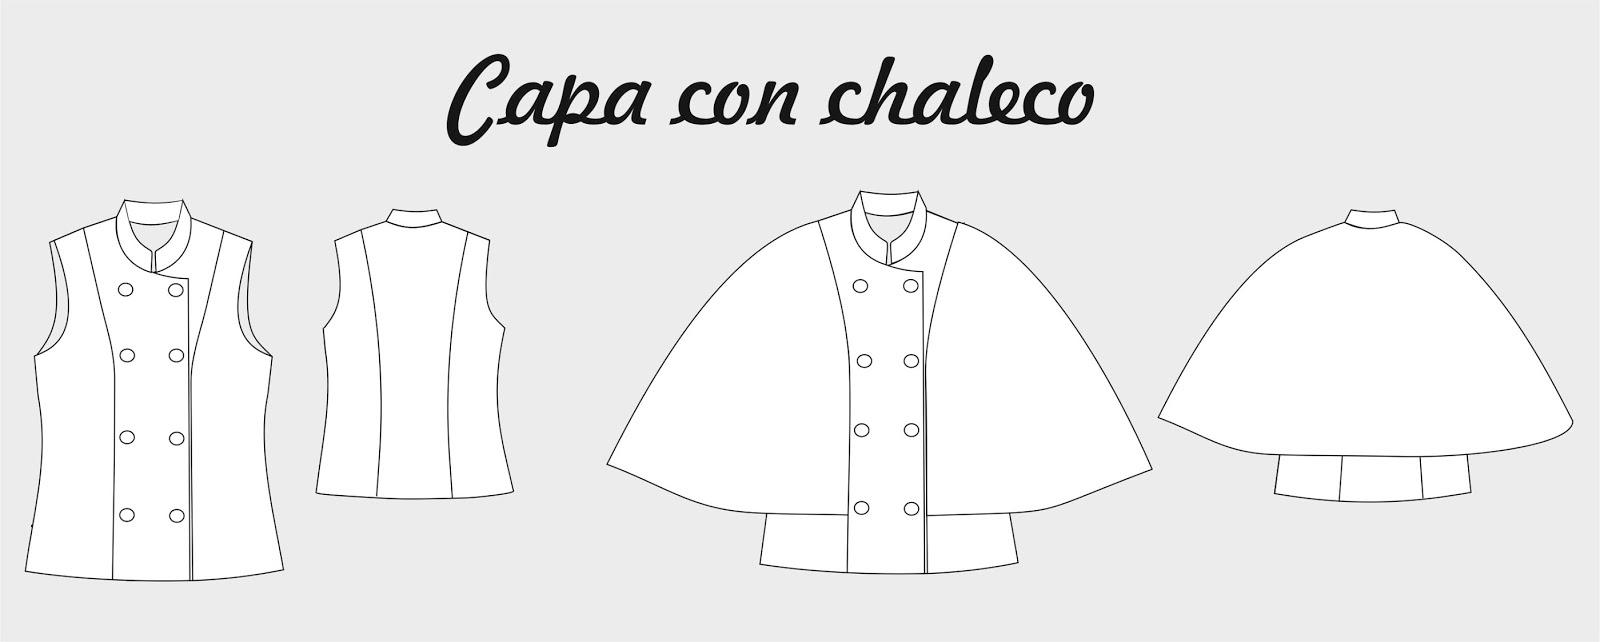 Capa con chaleco ~ Moda en la Costura